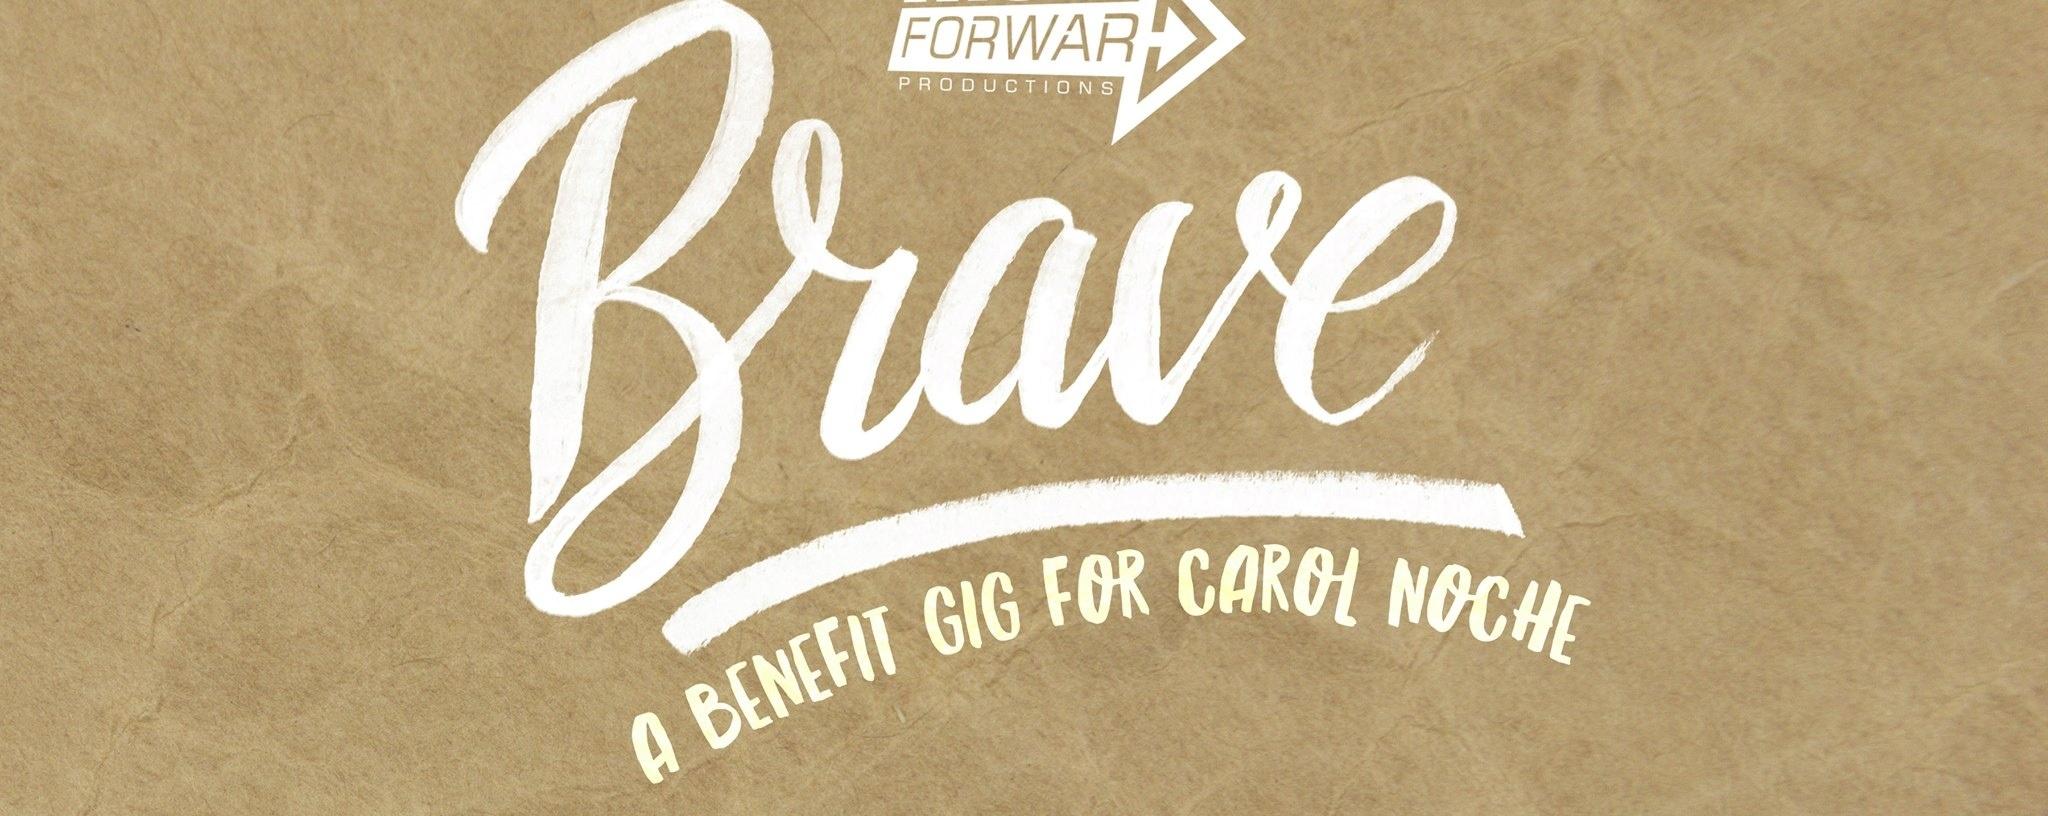 Brave: A Benefit Gig for Carol Noche